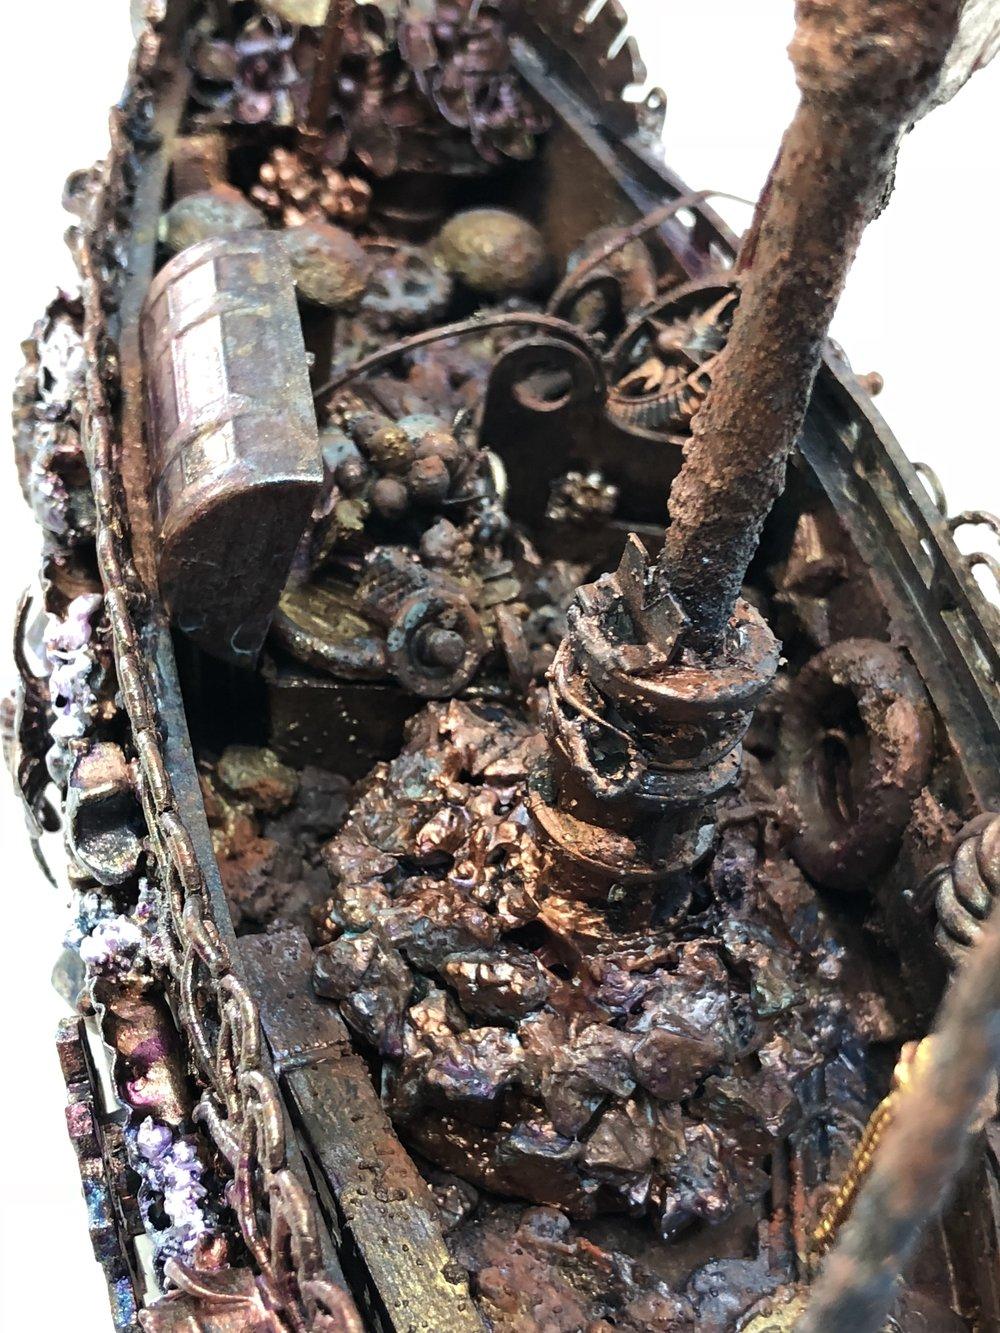 JunkboatIMG_0998 copy.jpg